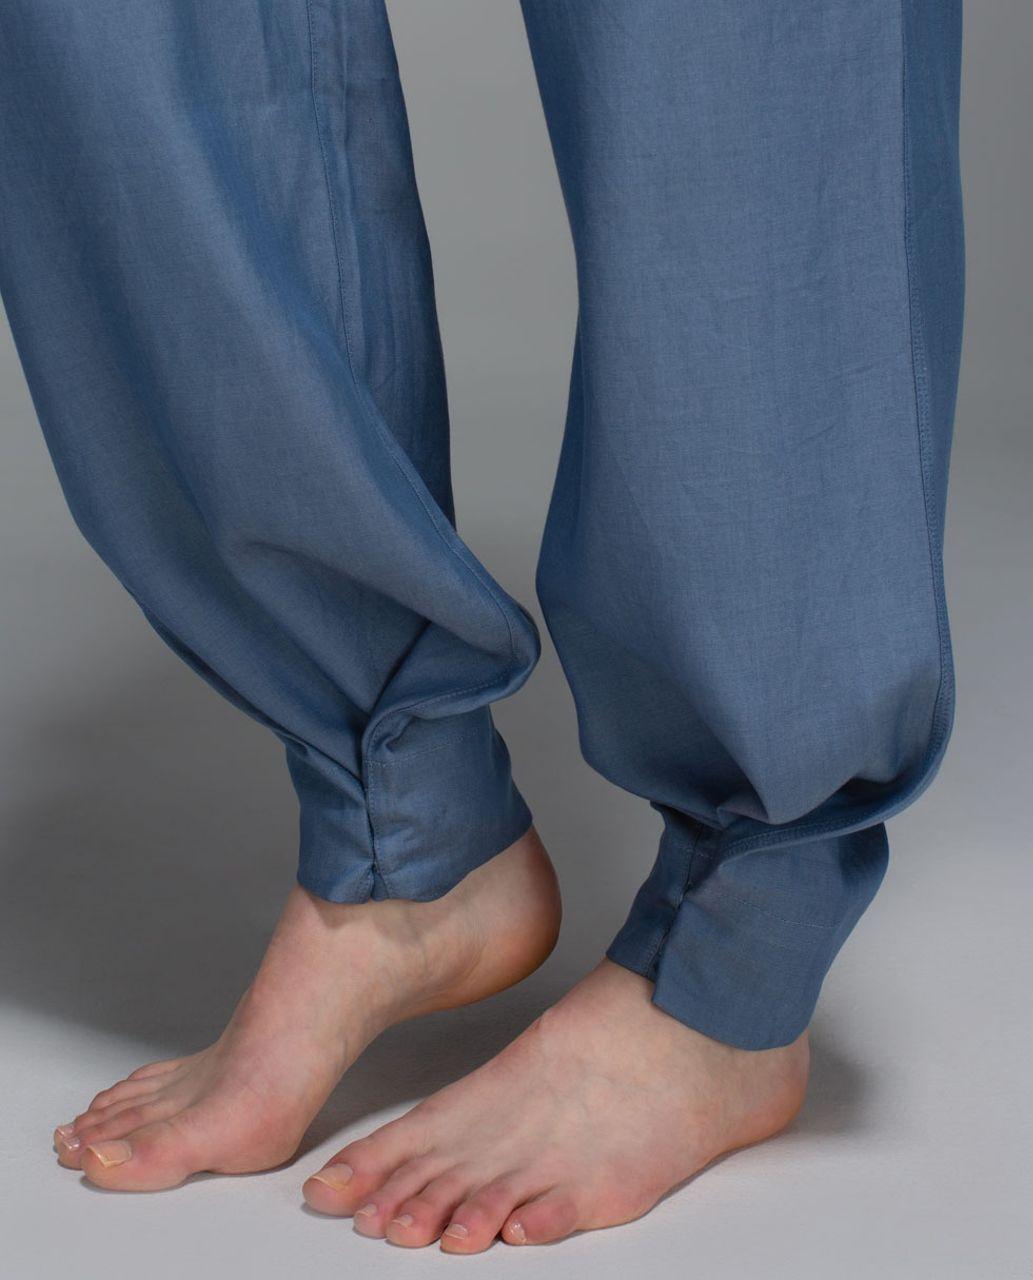 Lululemon Eazy Breezy Pant - Blue Denim